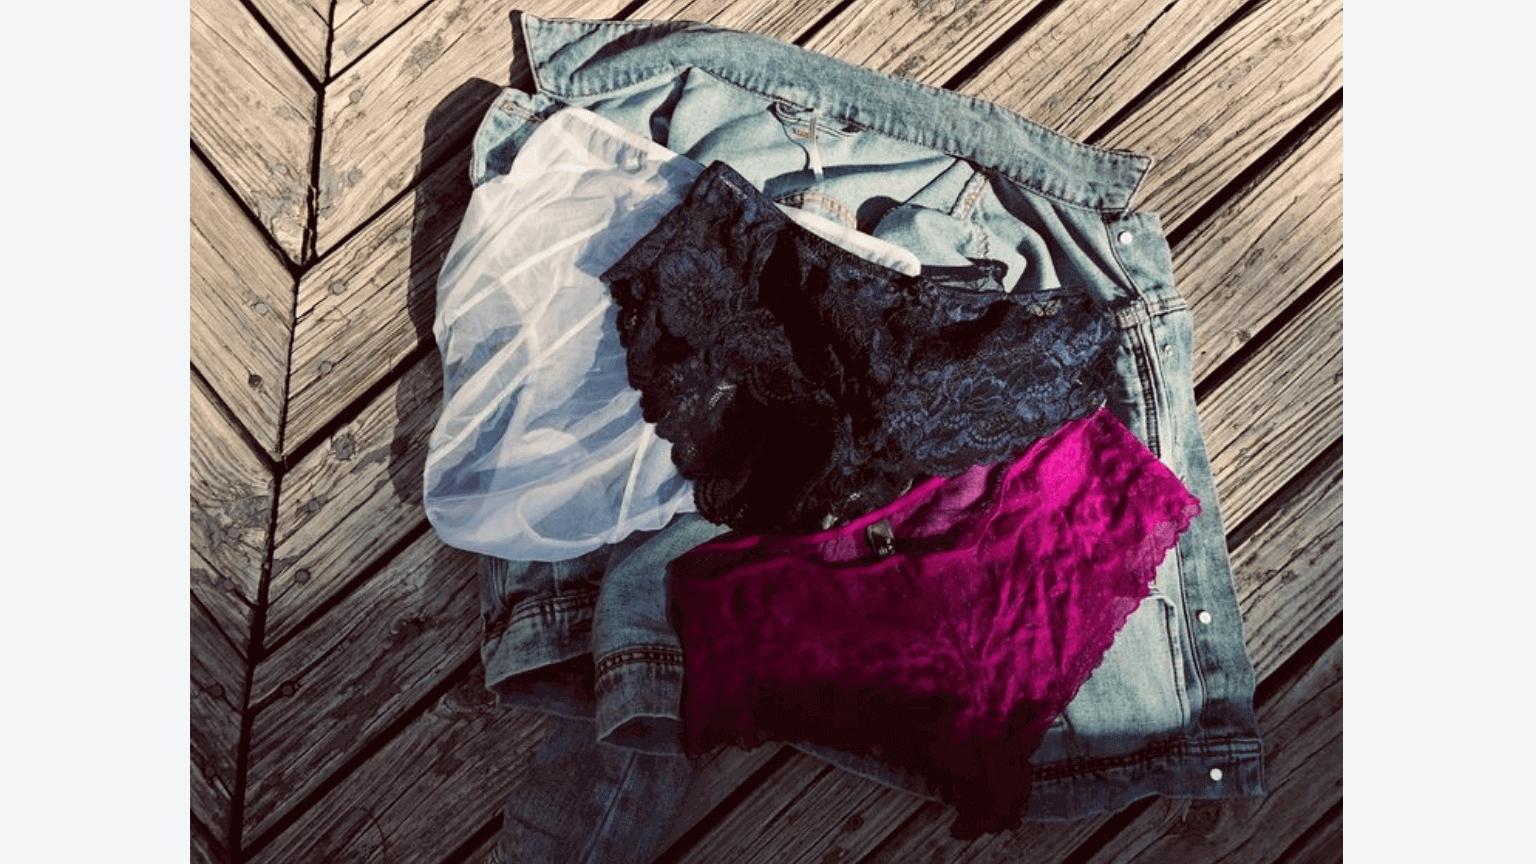 Underware clothing